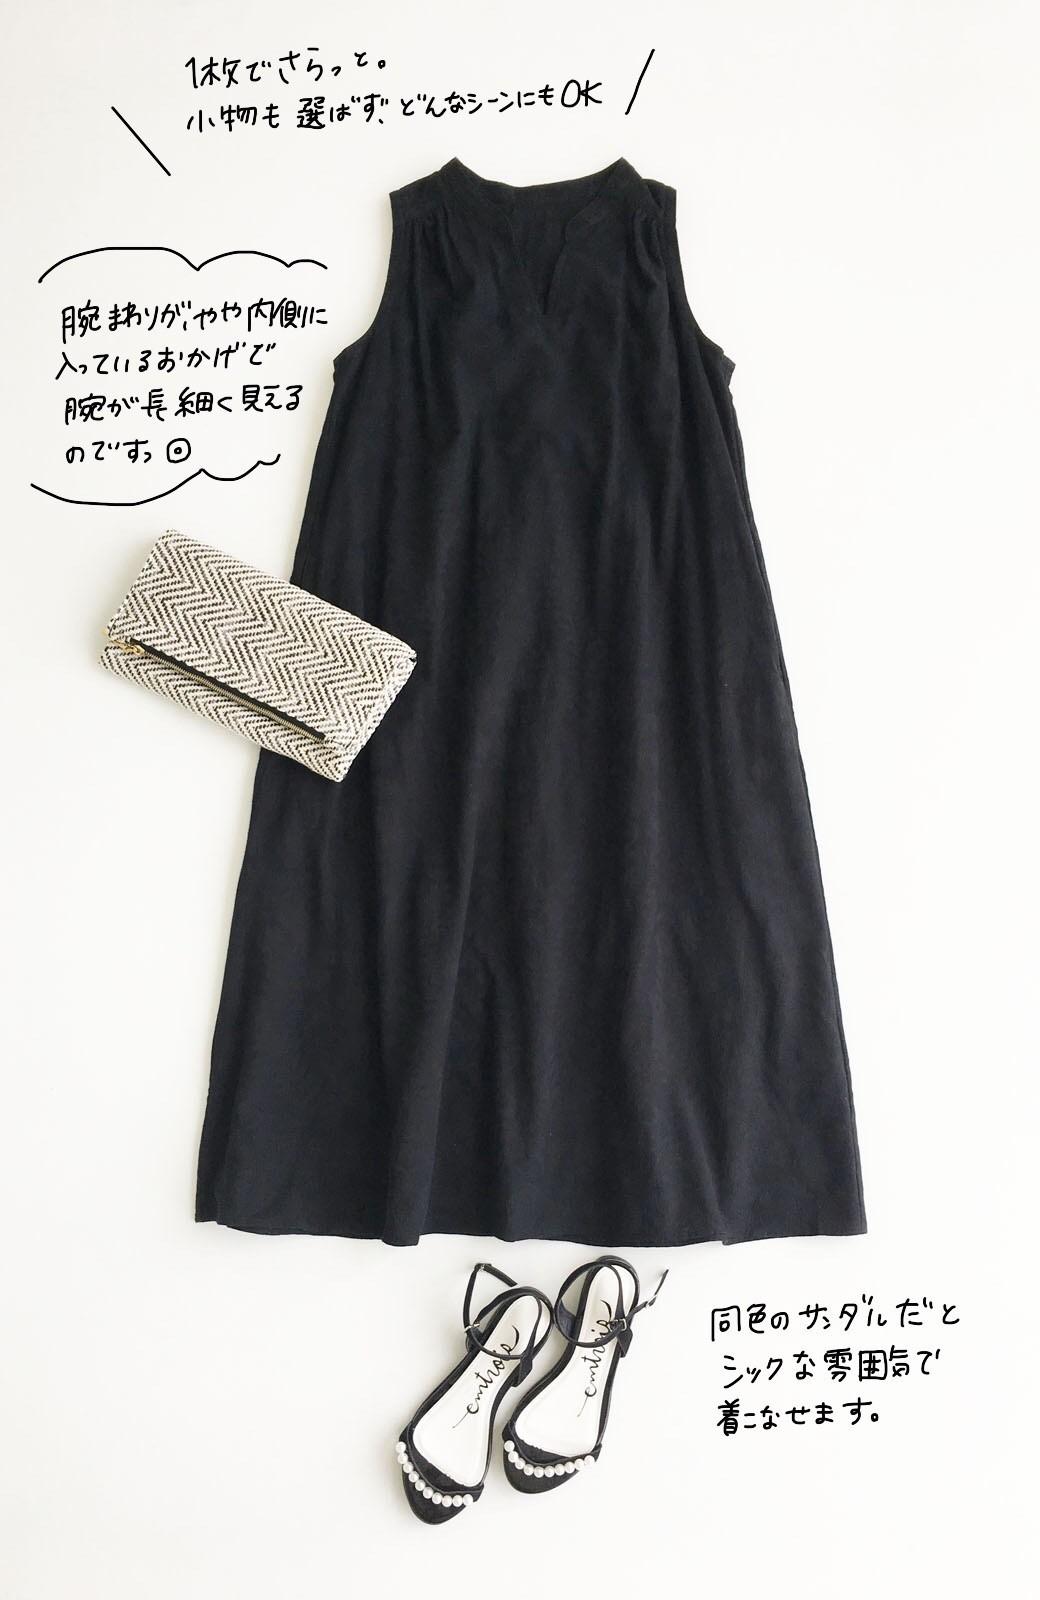 haco! 京都の浴衣屋さんと作った浴衣生地のロングワンピース <ブラック>の商品写真22